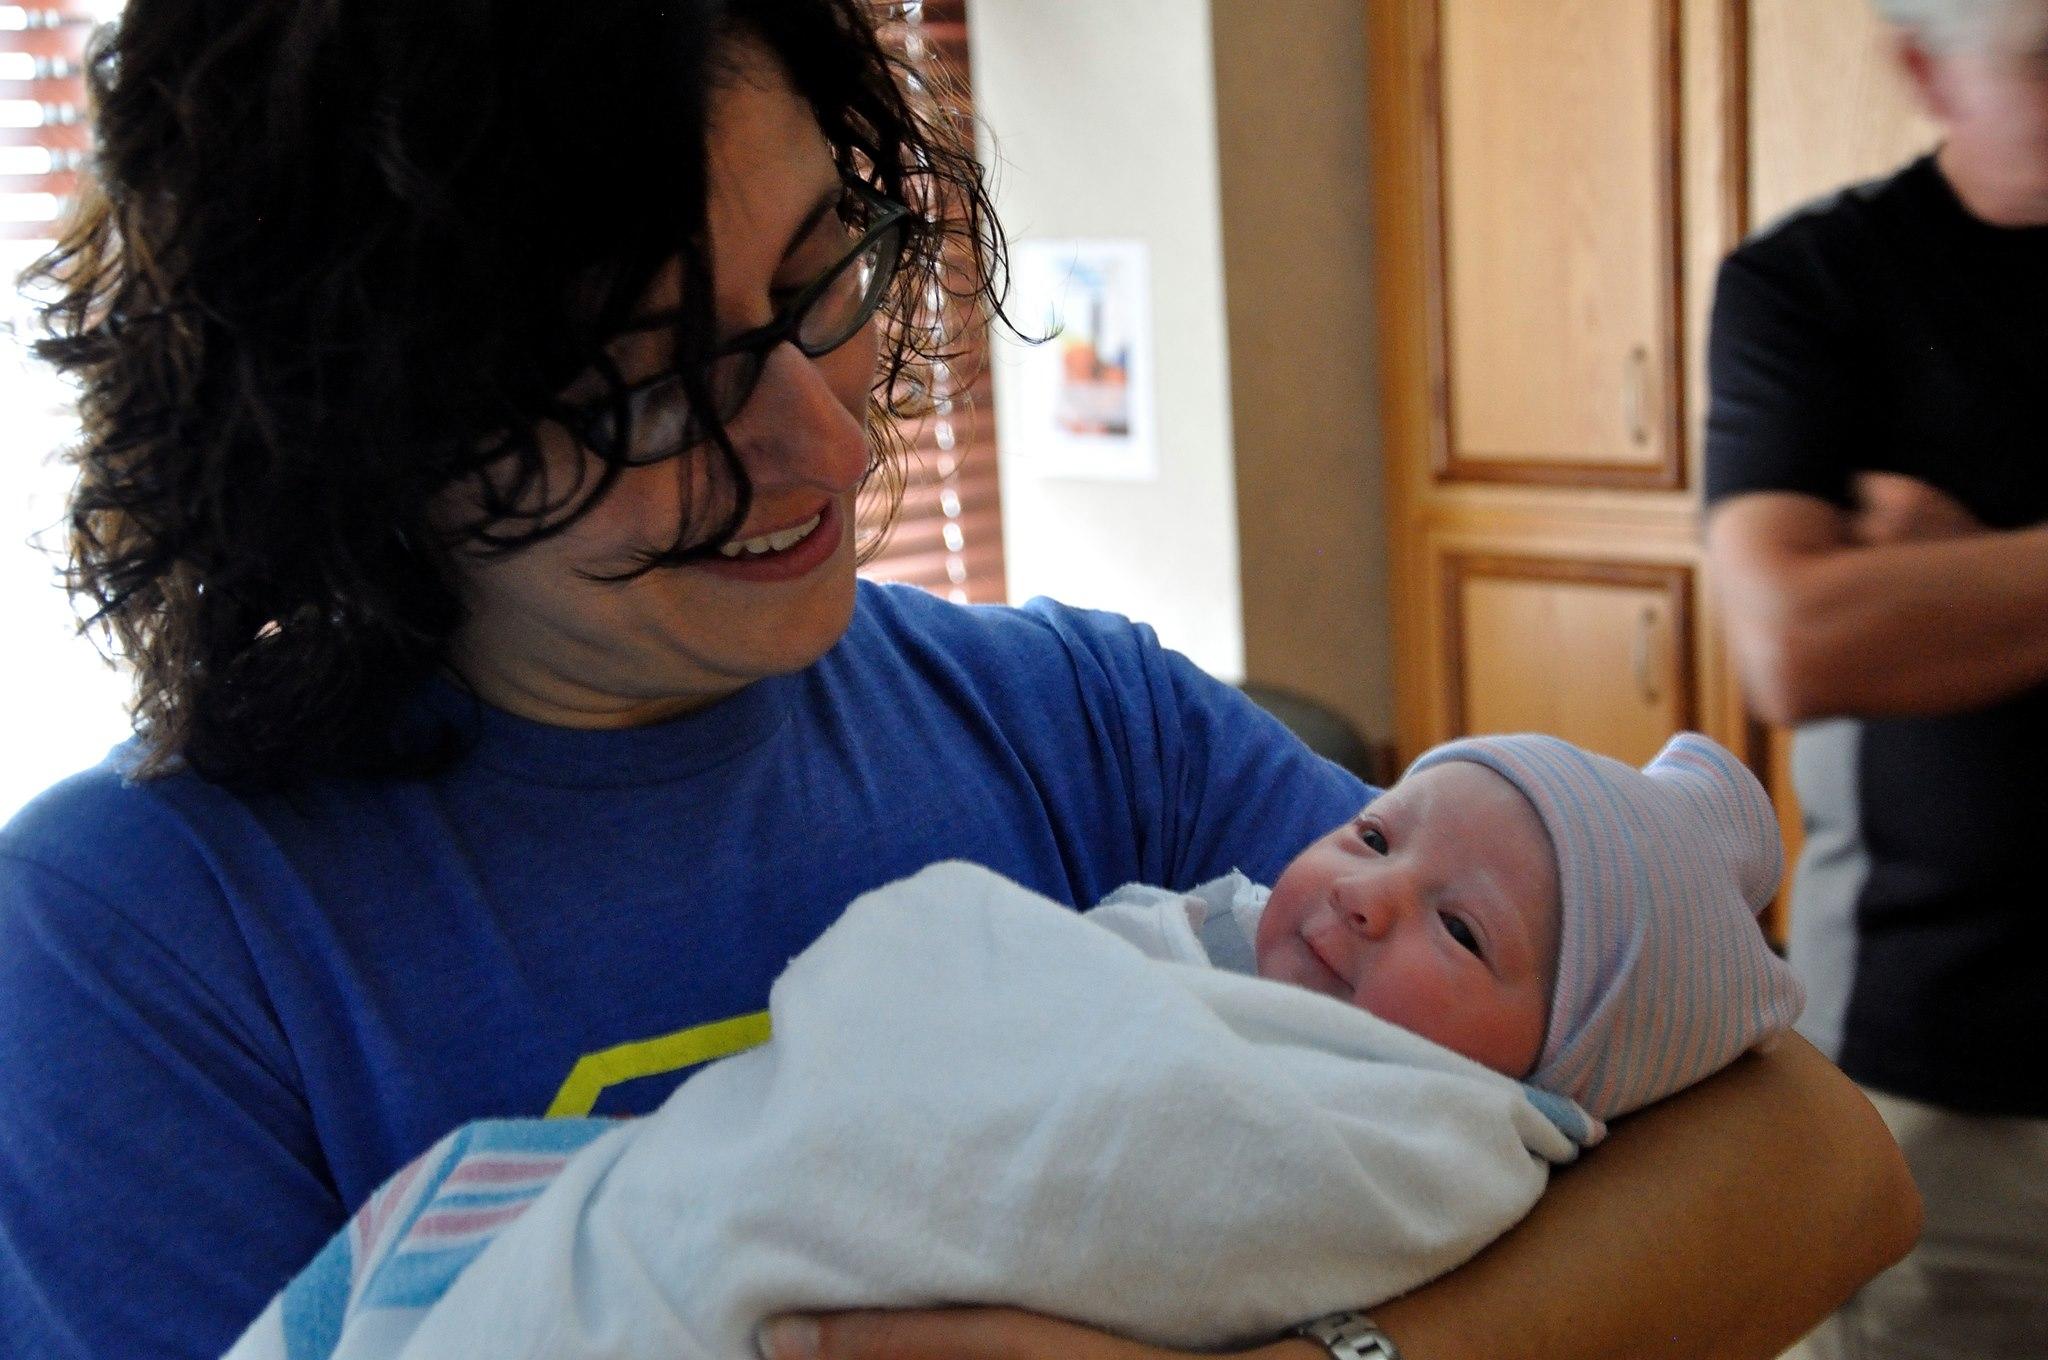 Kaitlan's Hypnobabies Birth story - Kohler Created